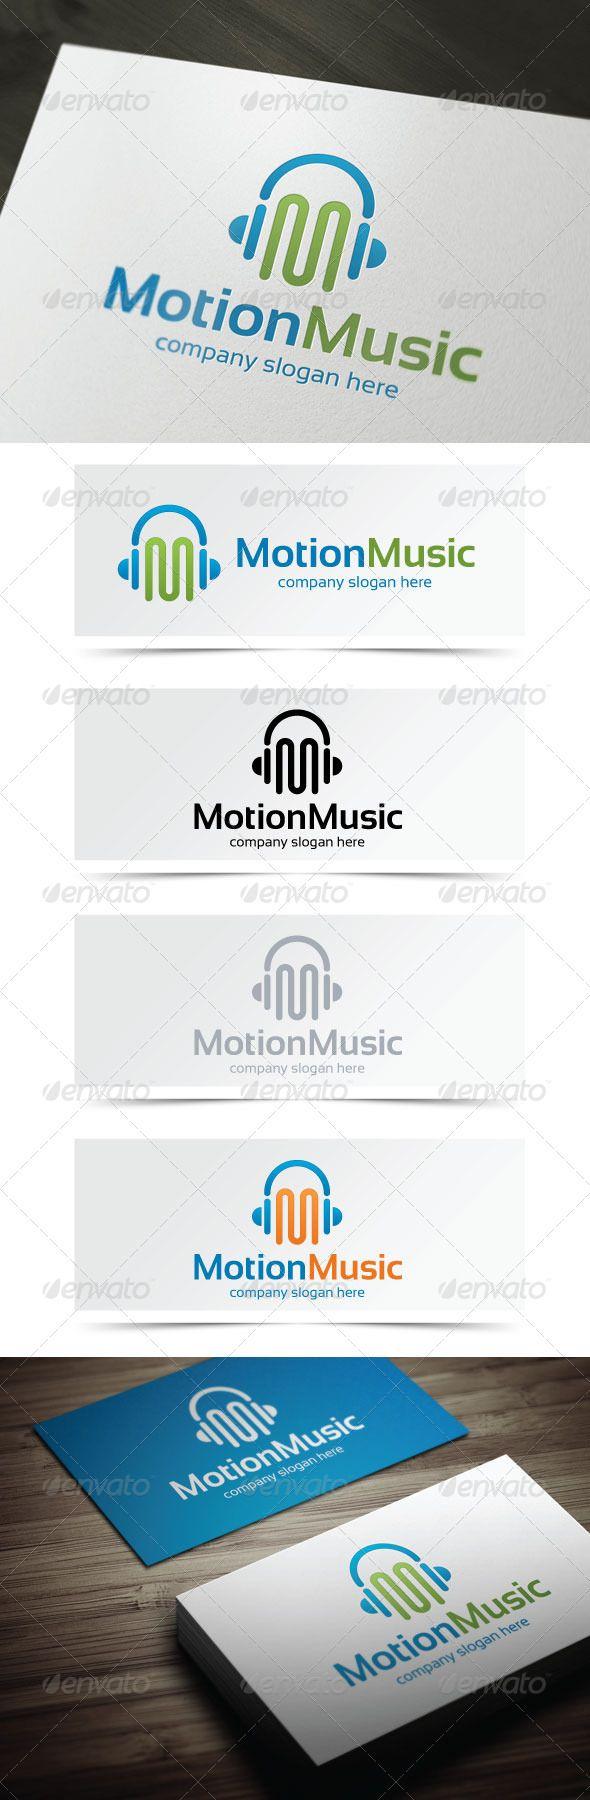 Motion Music http://graphicriver.net/user/debo243/portfolio